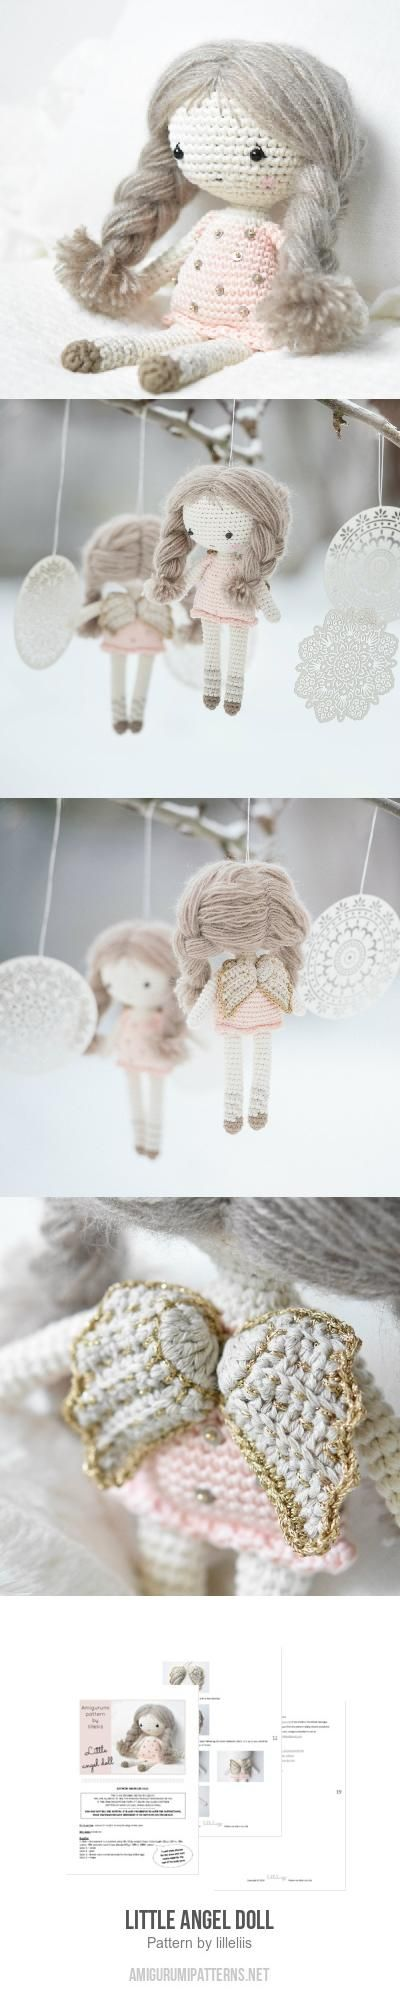 Little Angel Doll Amigurumi Pattern                                                                                                                                                                                 More